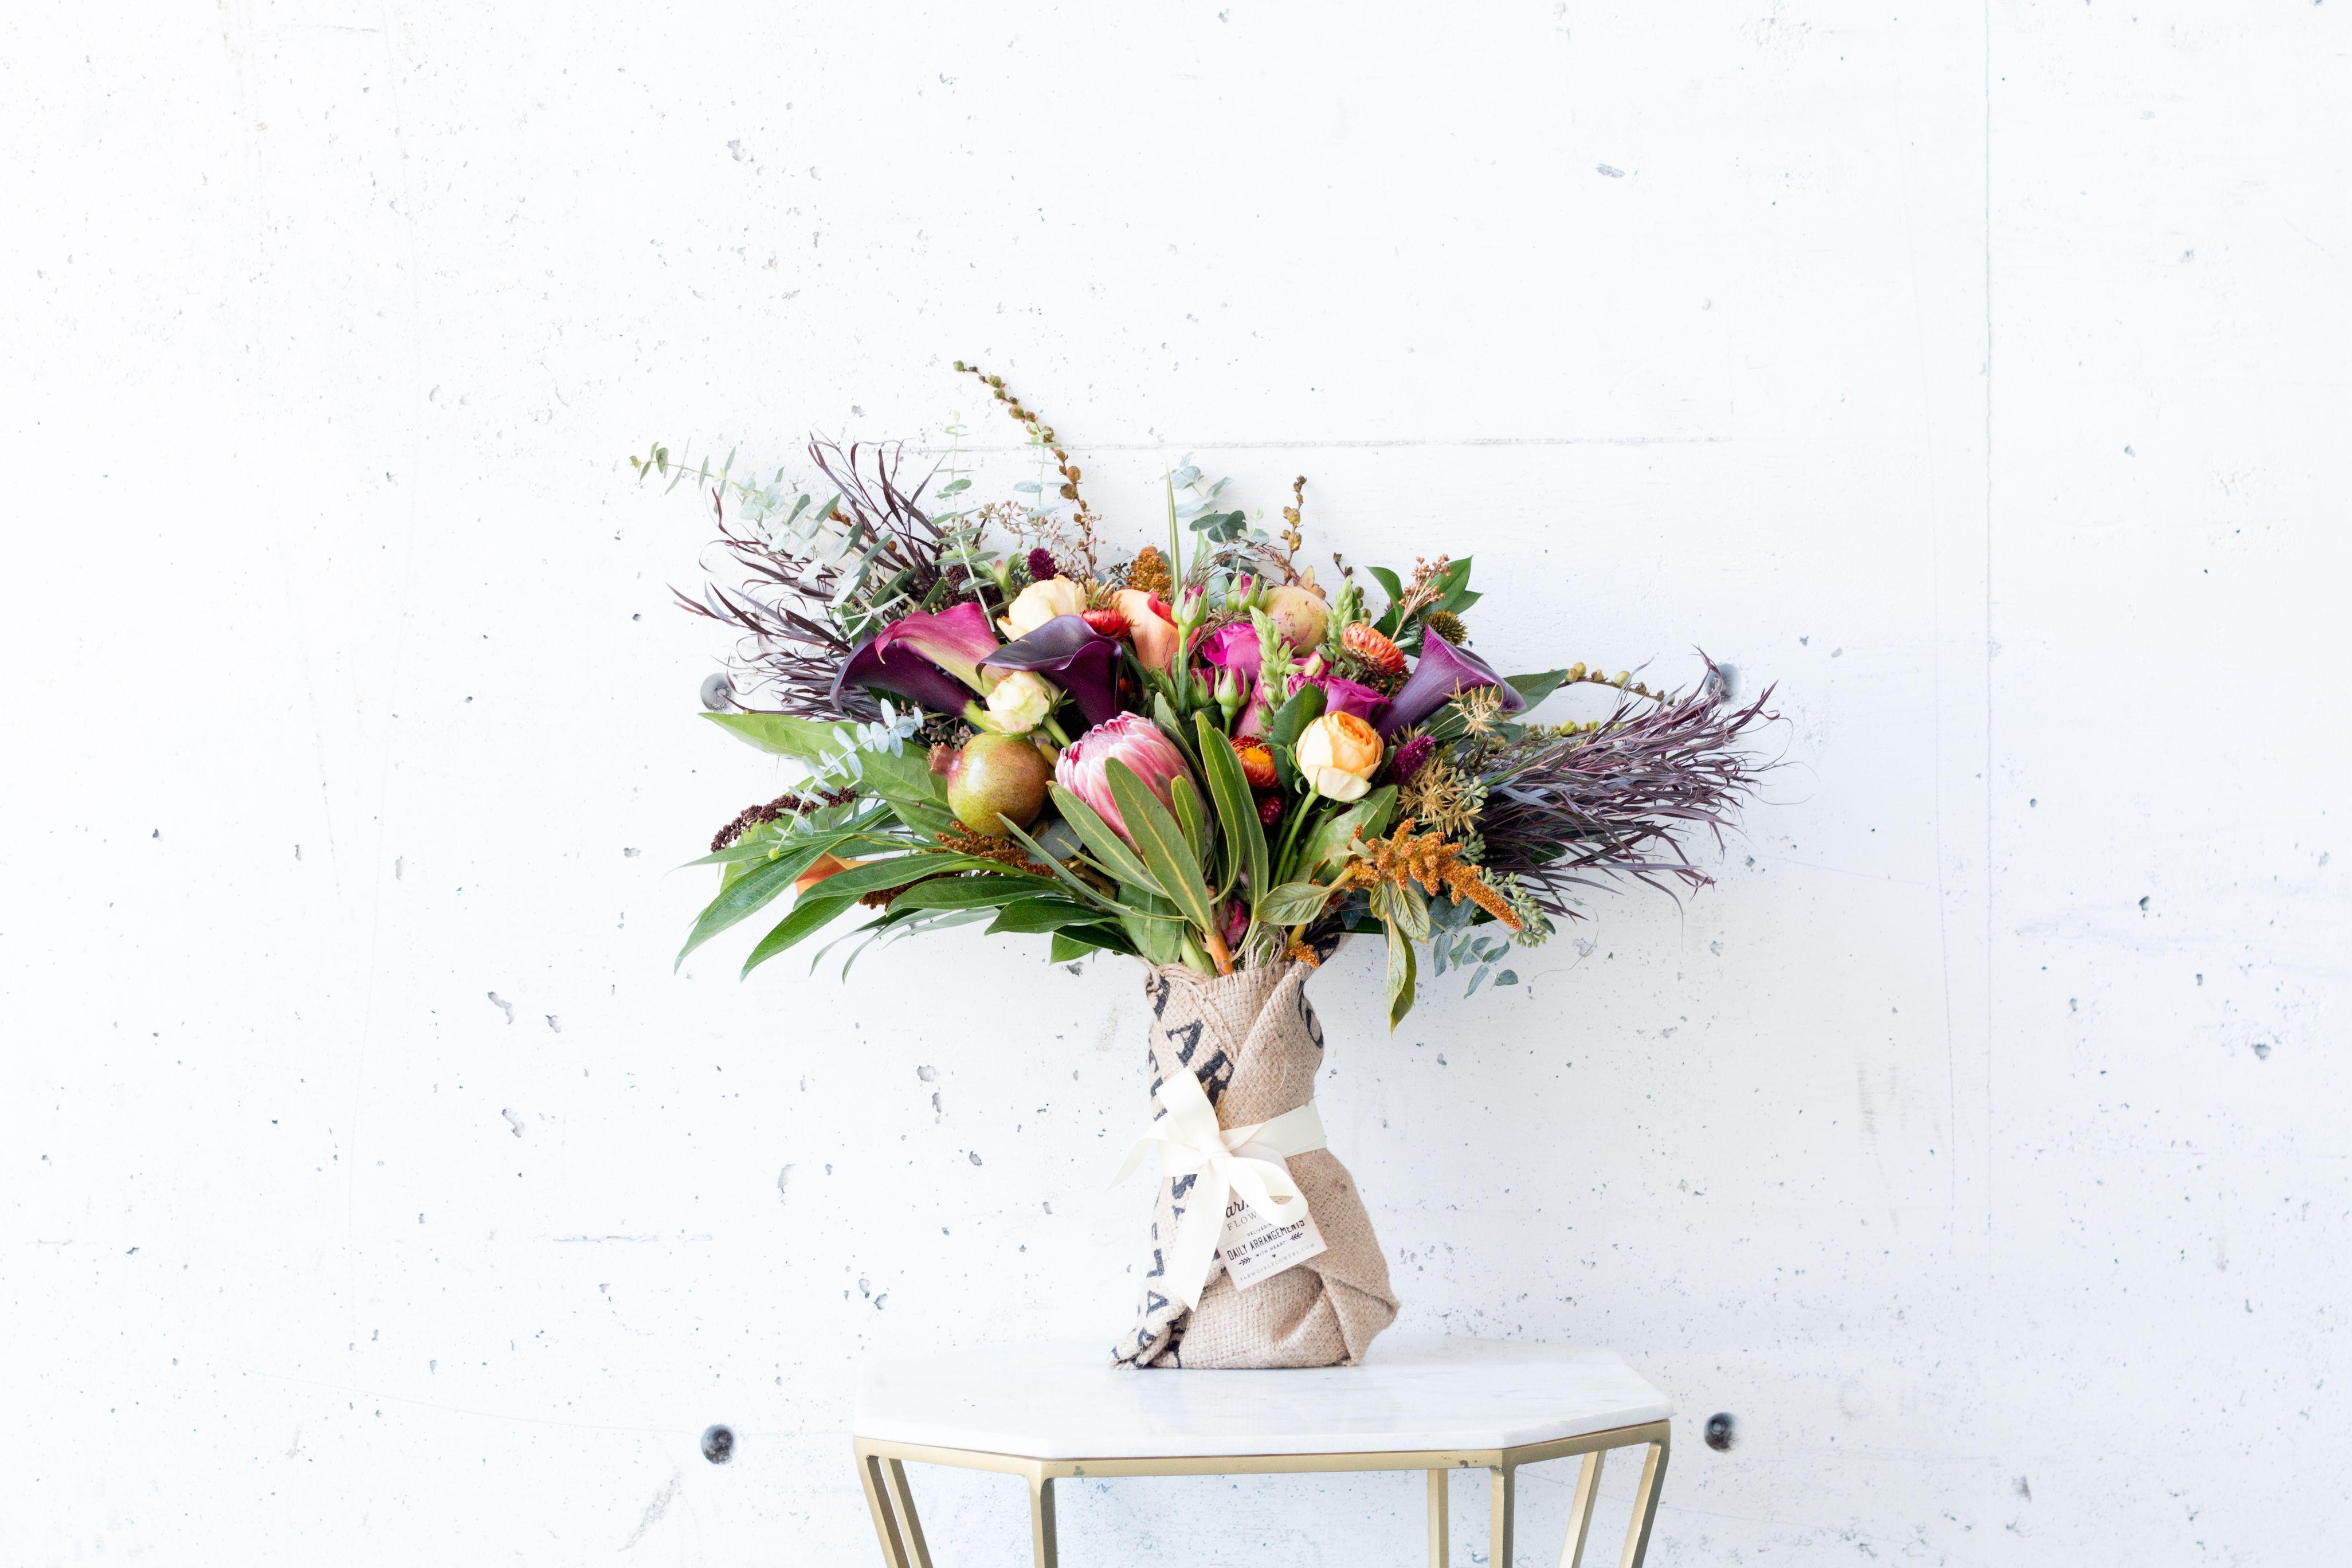 Fall Flower Arrangements - Pretty Autumn Floral Arranging Ideas